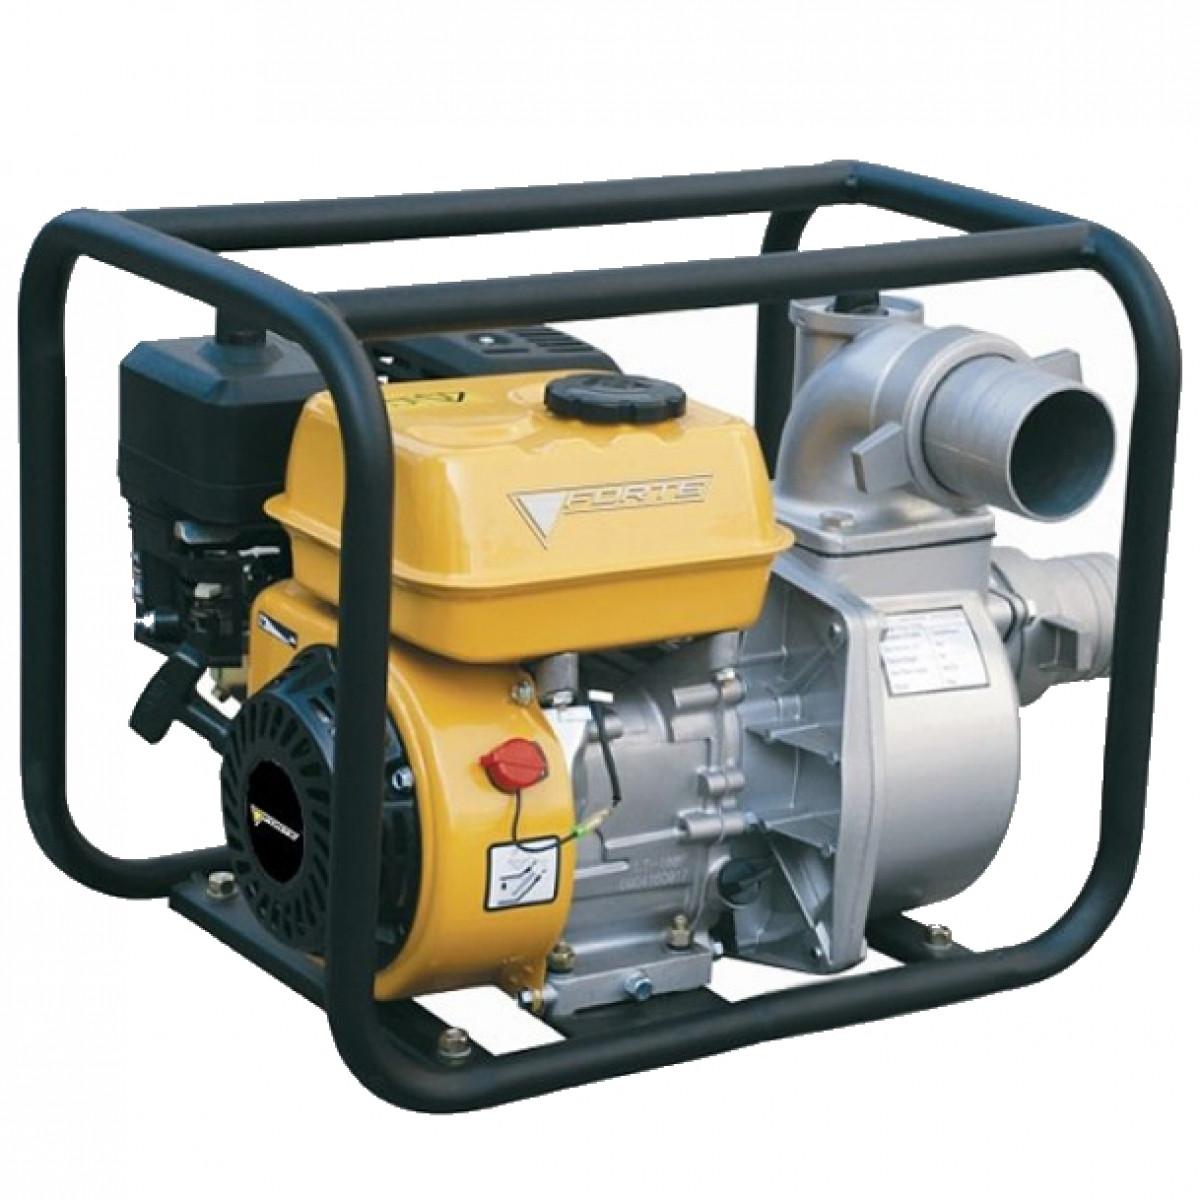 Мотопомпа бензинова Forte FP30C 4,7 кВт бензо мотопомпа